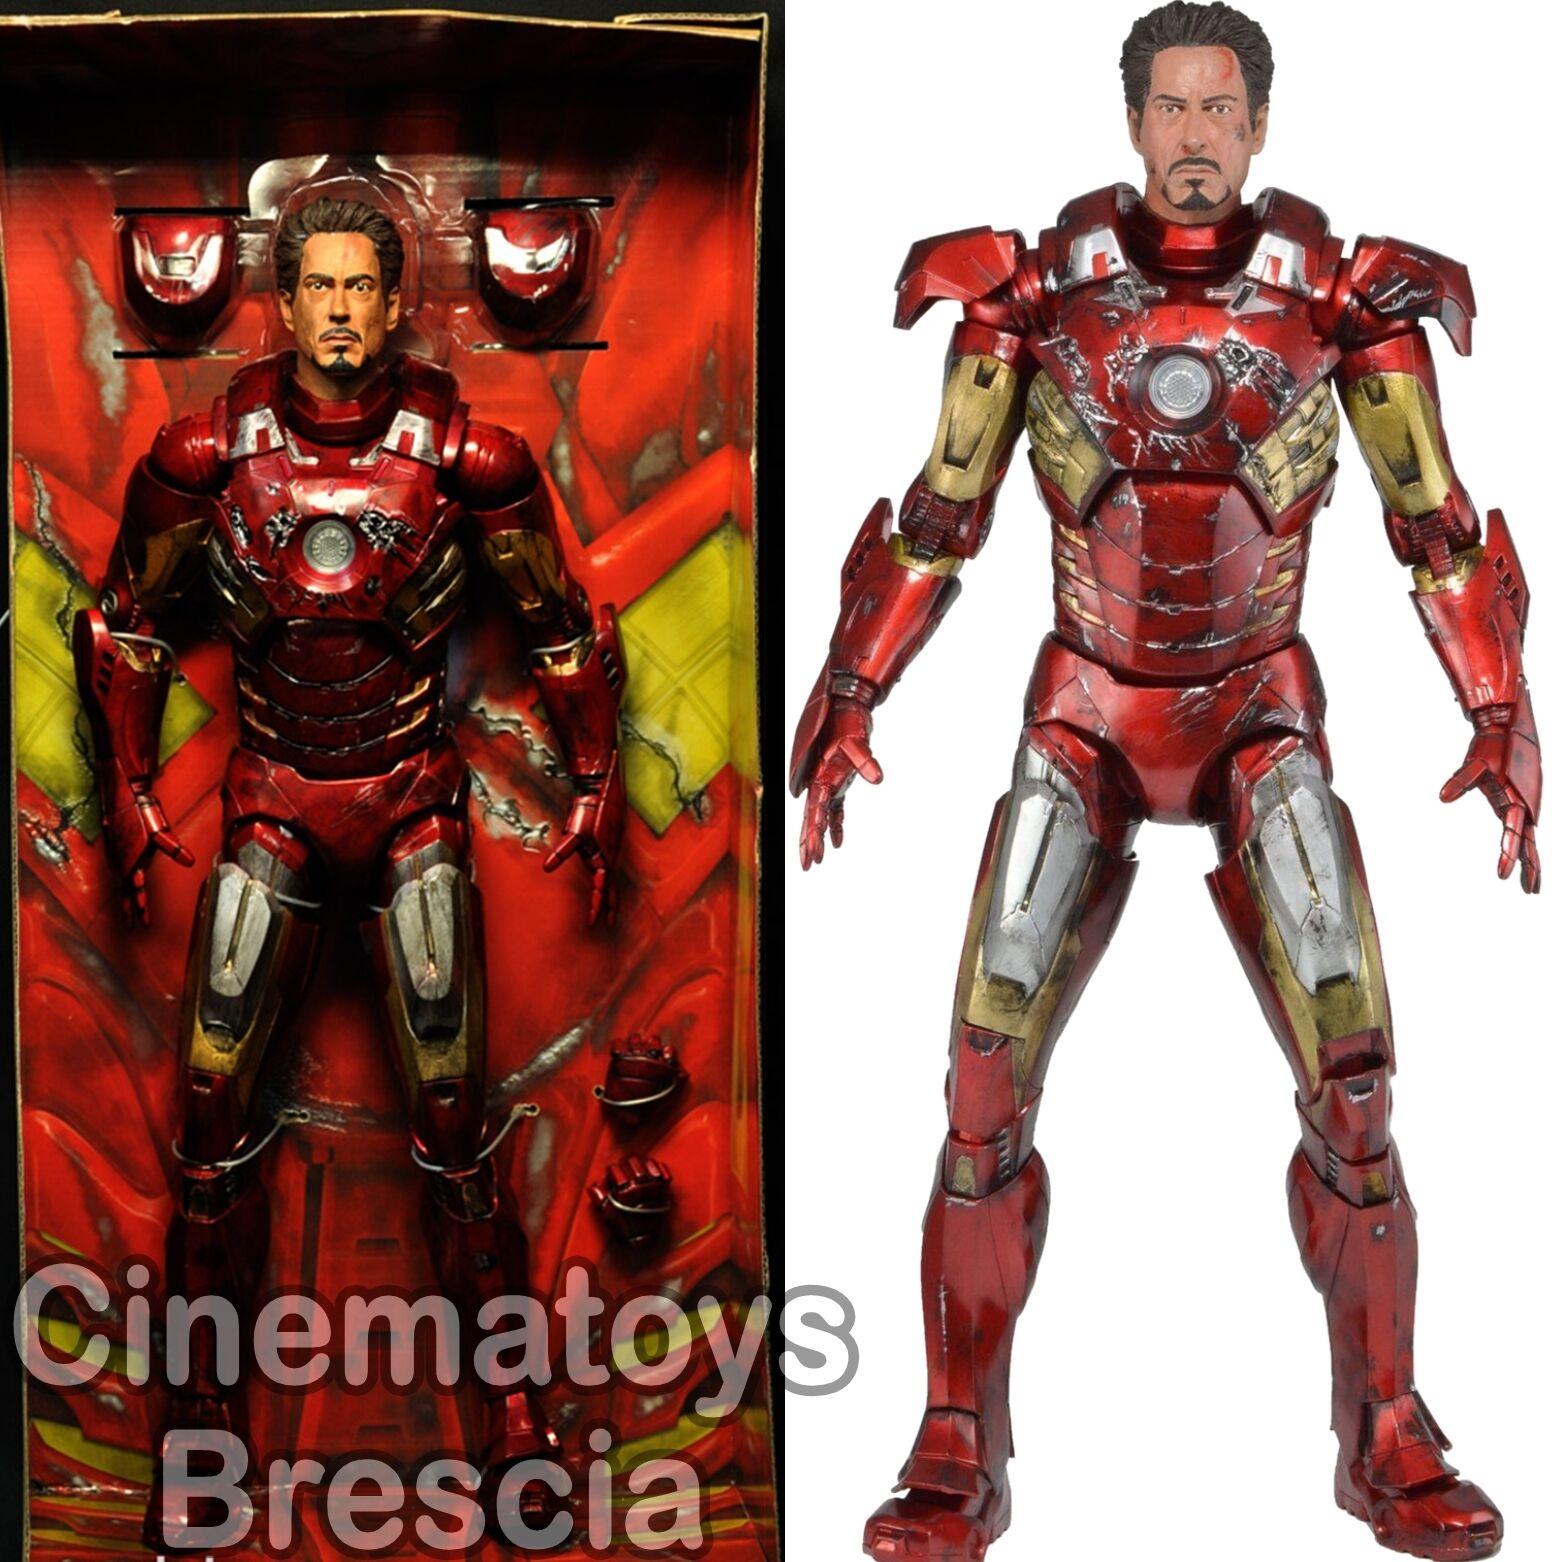 MARVEL The Avengers 1/4 Scale Action Figure Battle Damaged Eisen Mann w/LED NECA